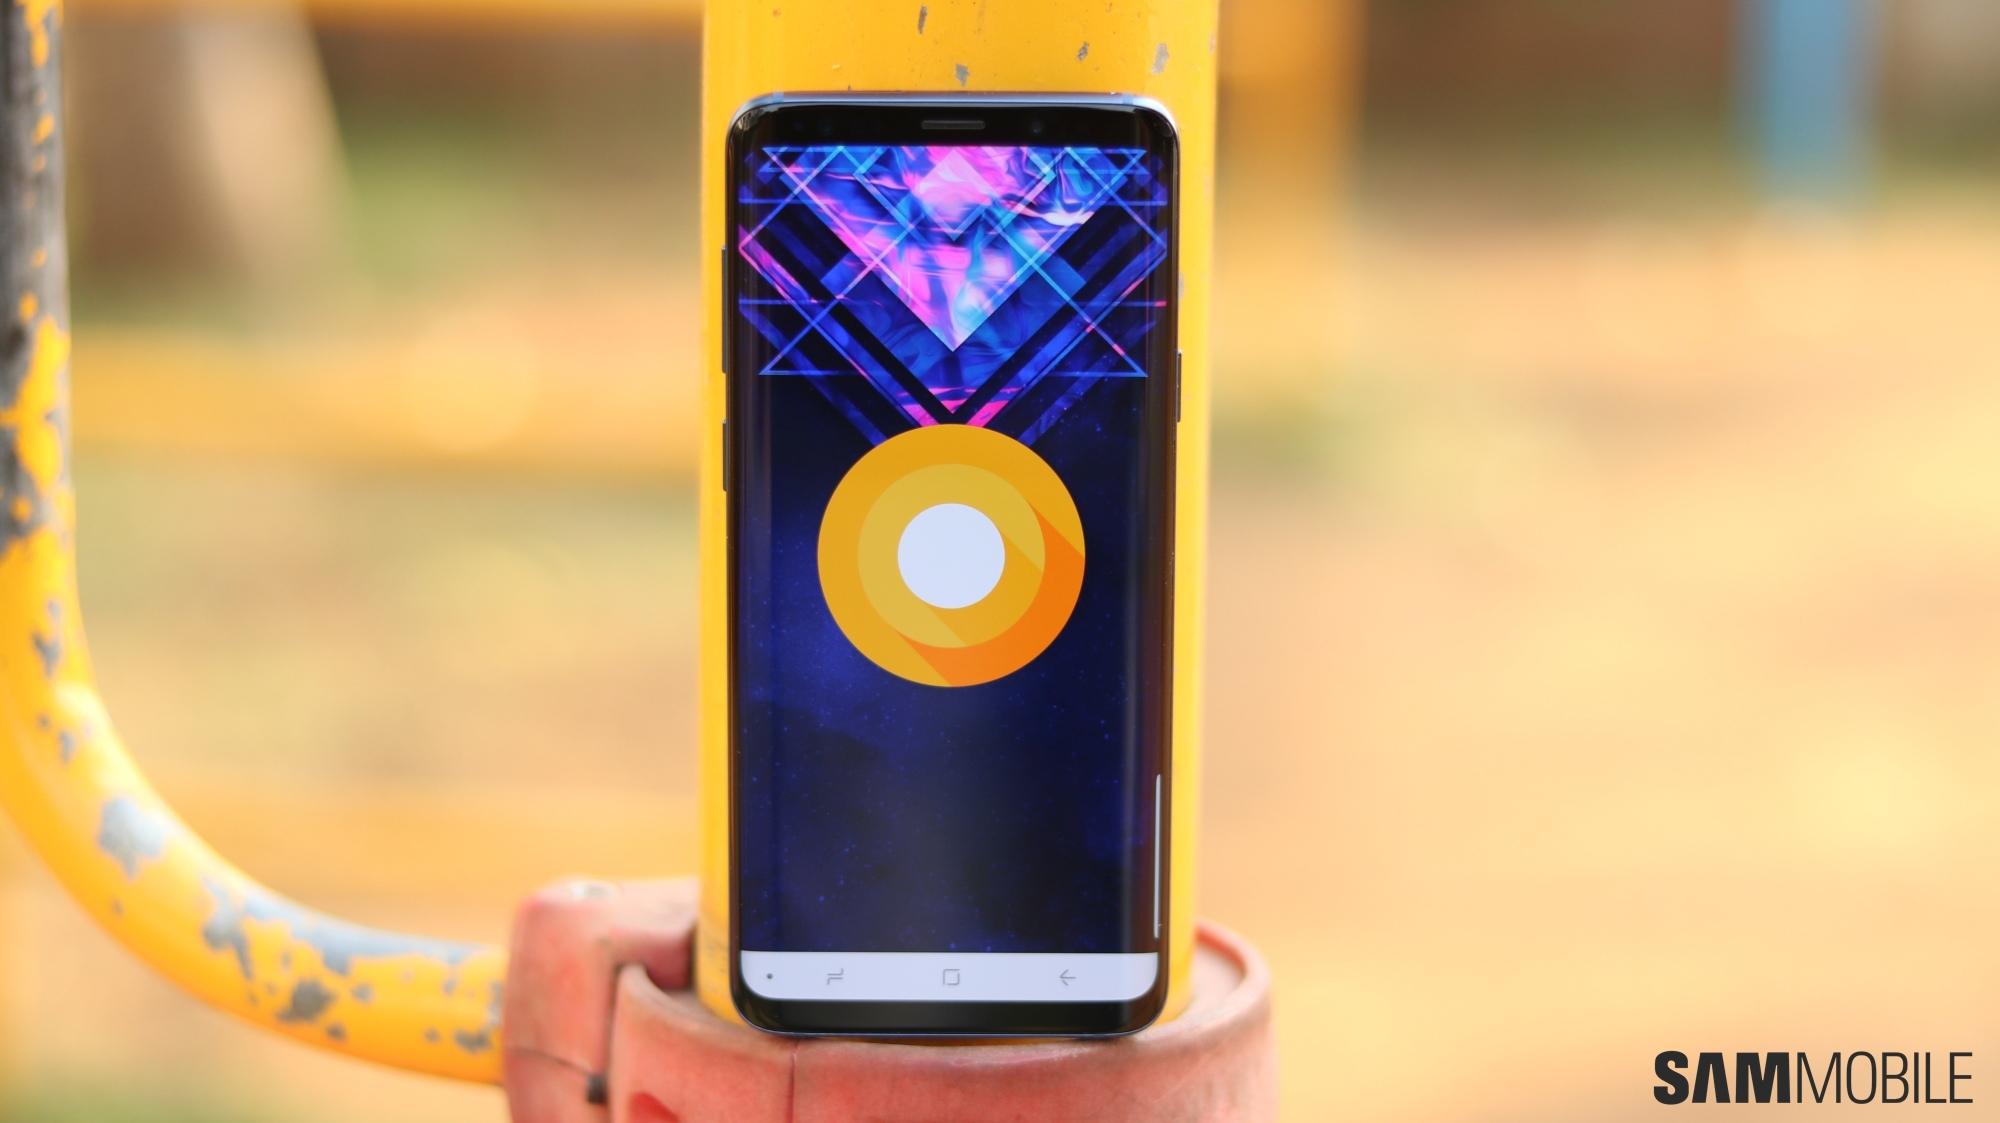 Samsung Galaxy S9 - SamMobile